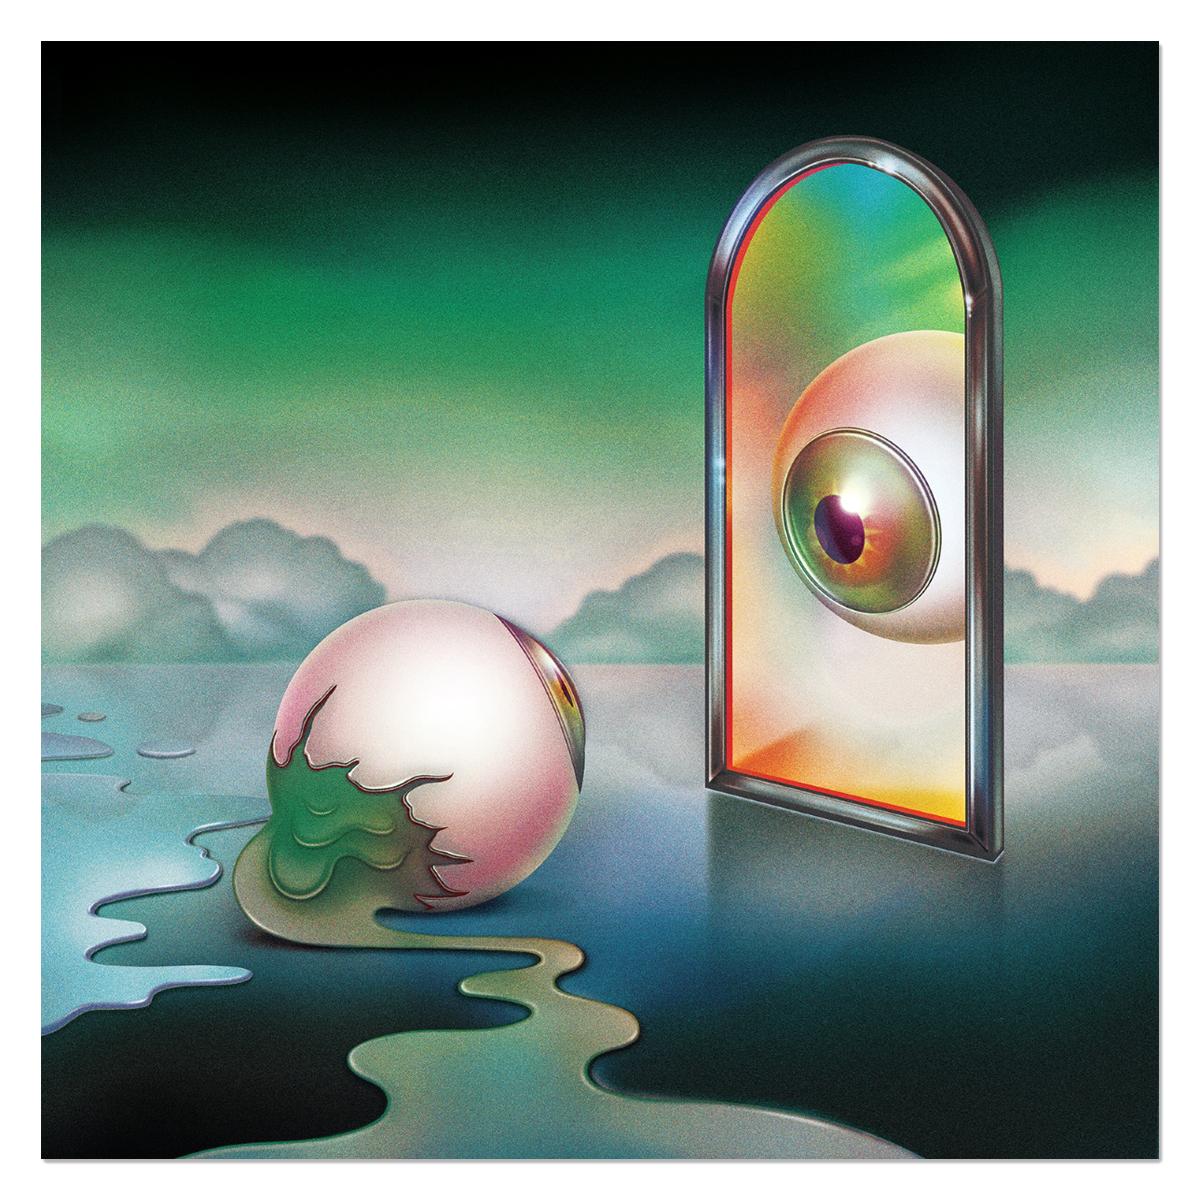 Nick Hakim - Green Twins - Digital Album